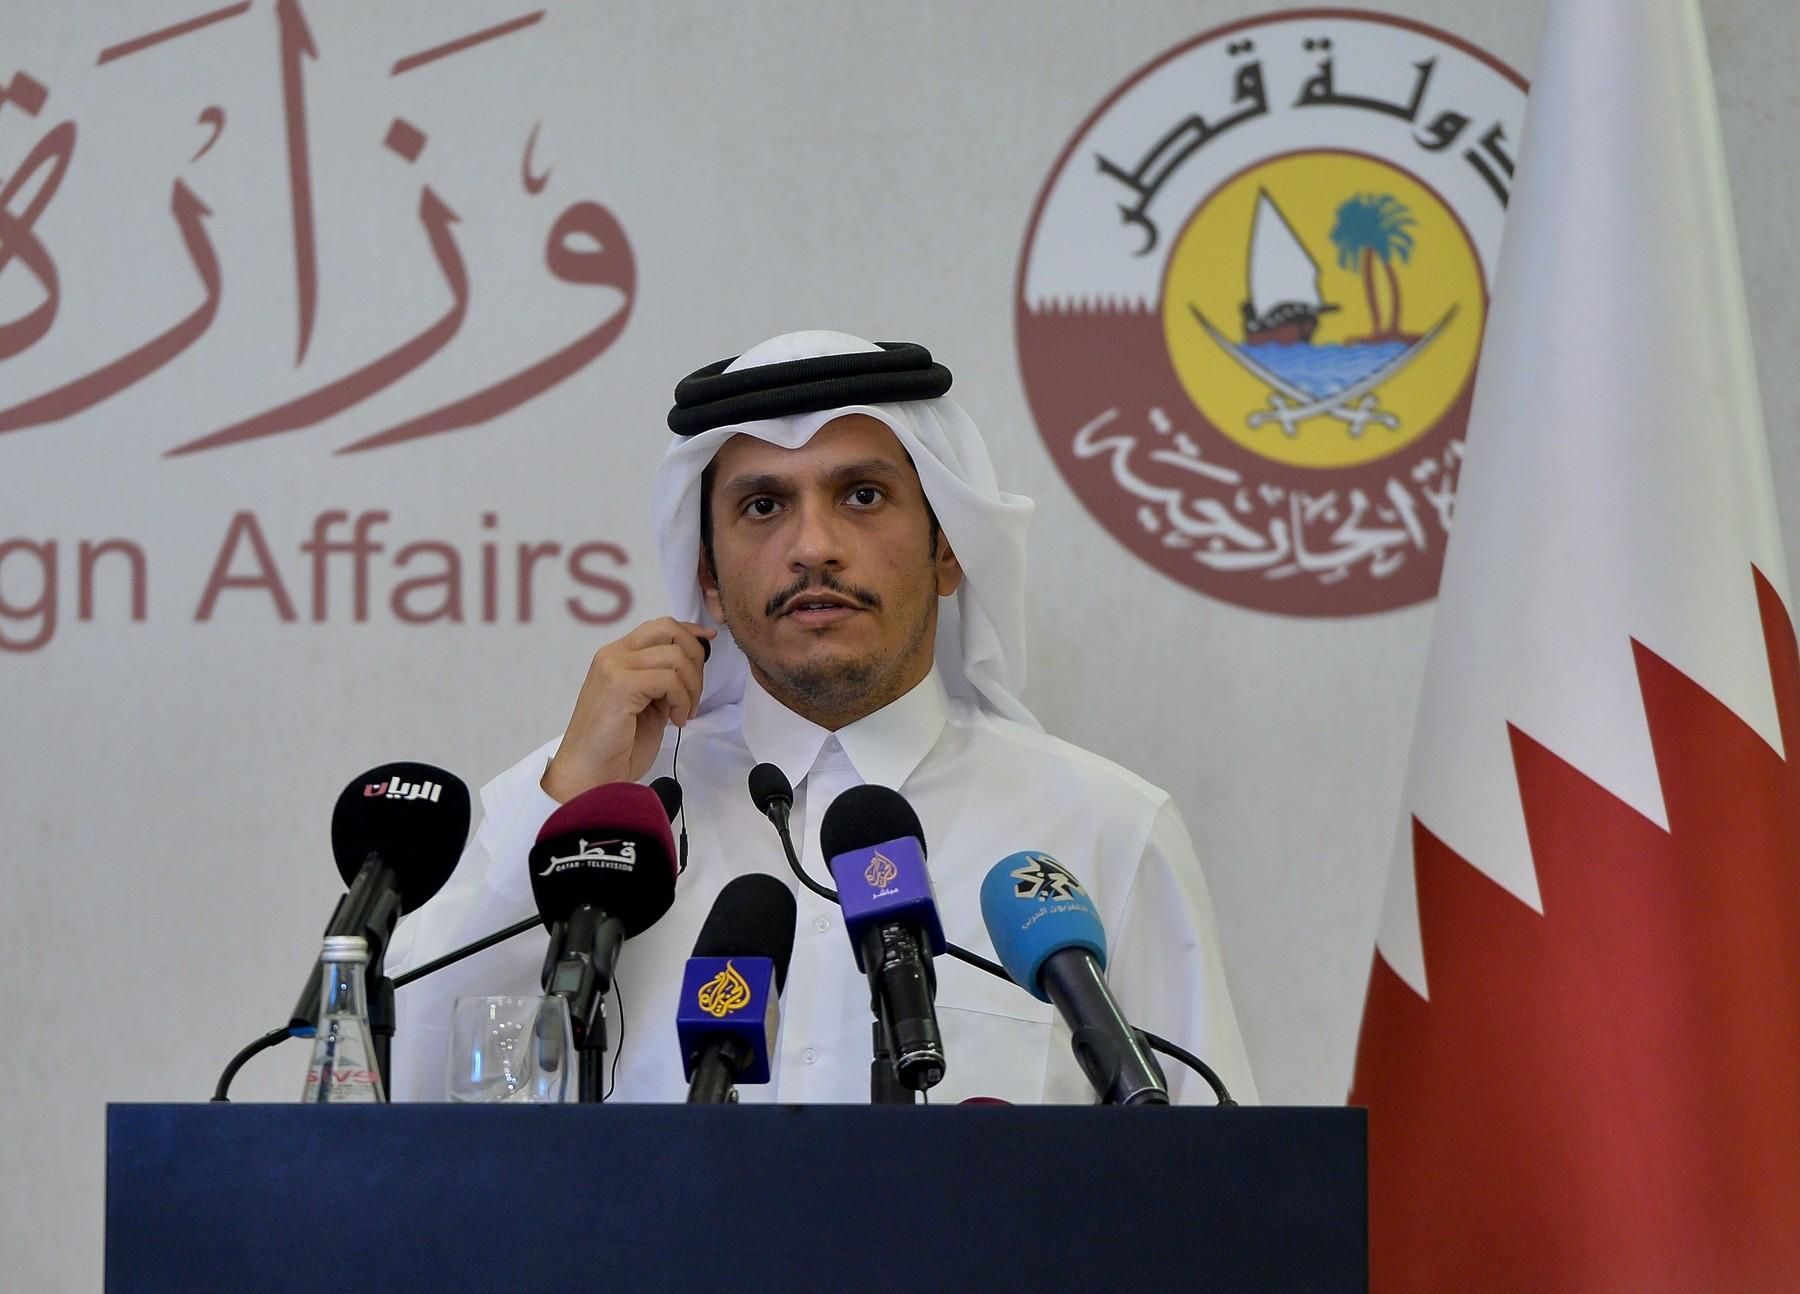 katarski ministar vanjskih poslova, šeik Mohammed bin Abdulrahman al-Thani